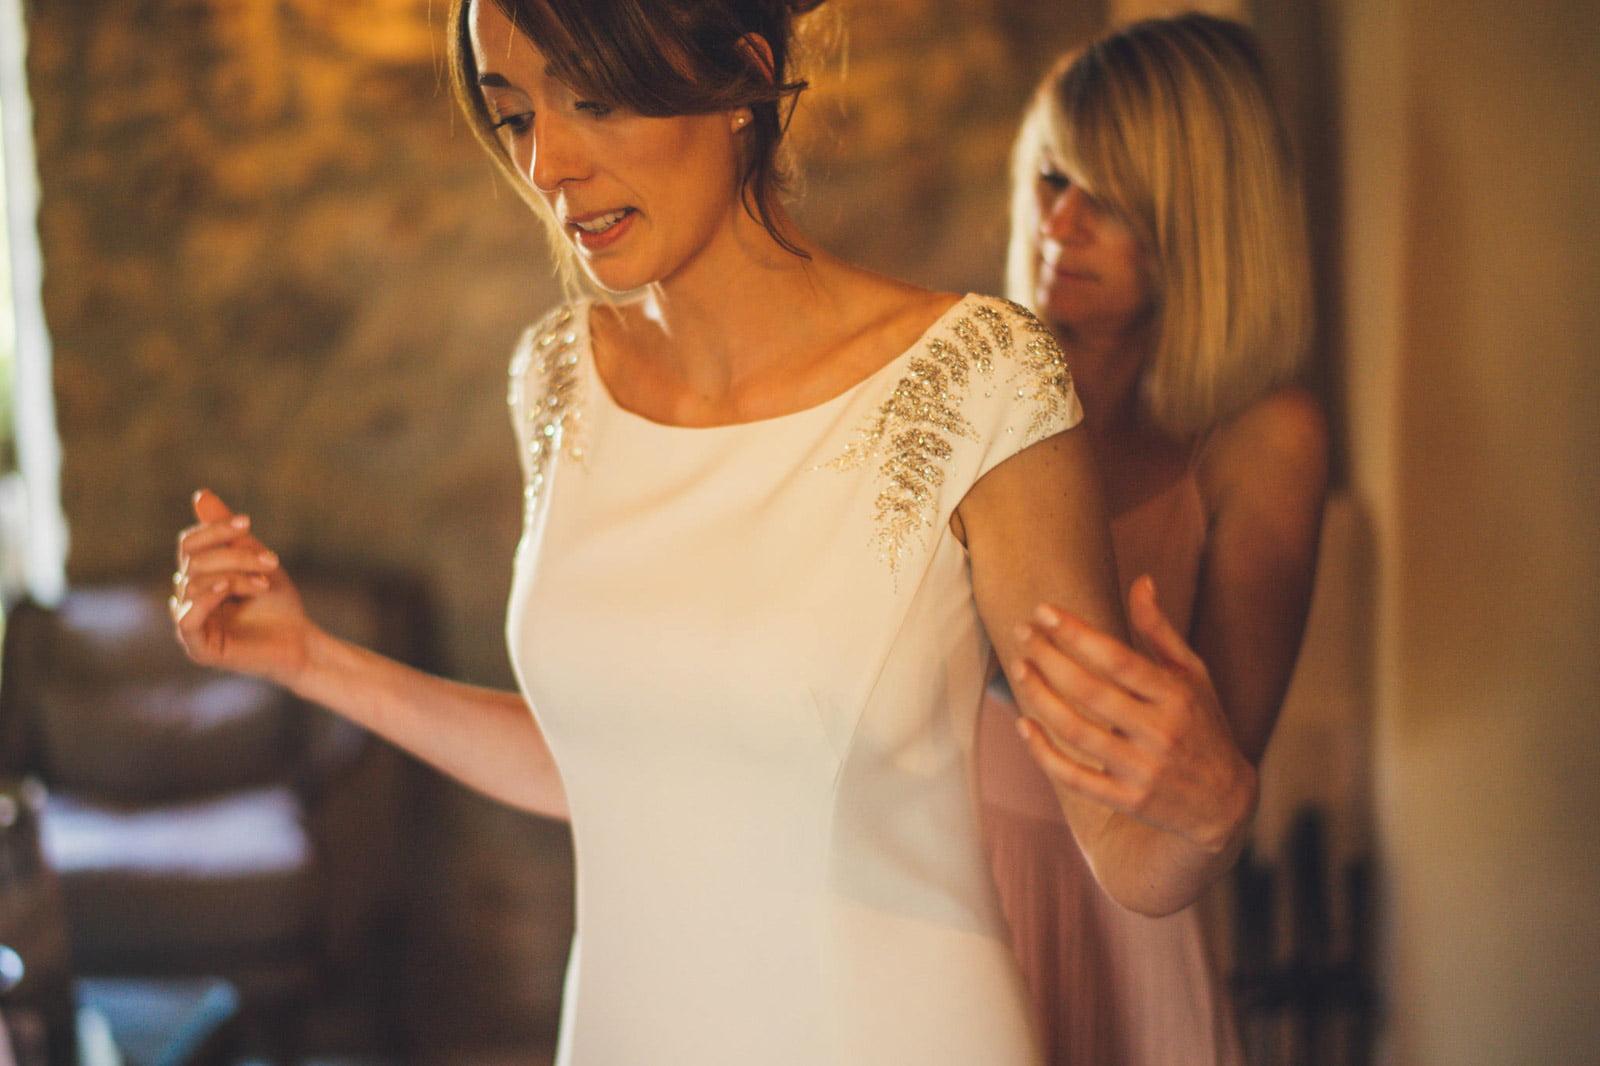 020-wedding-tuscany-san-galgano-federico-pannacci-photographer